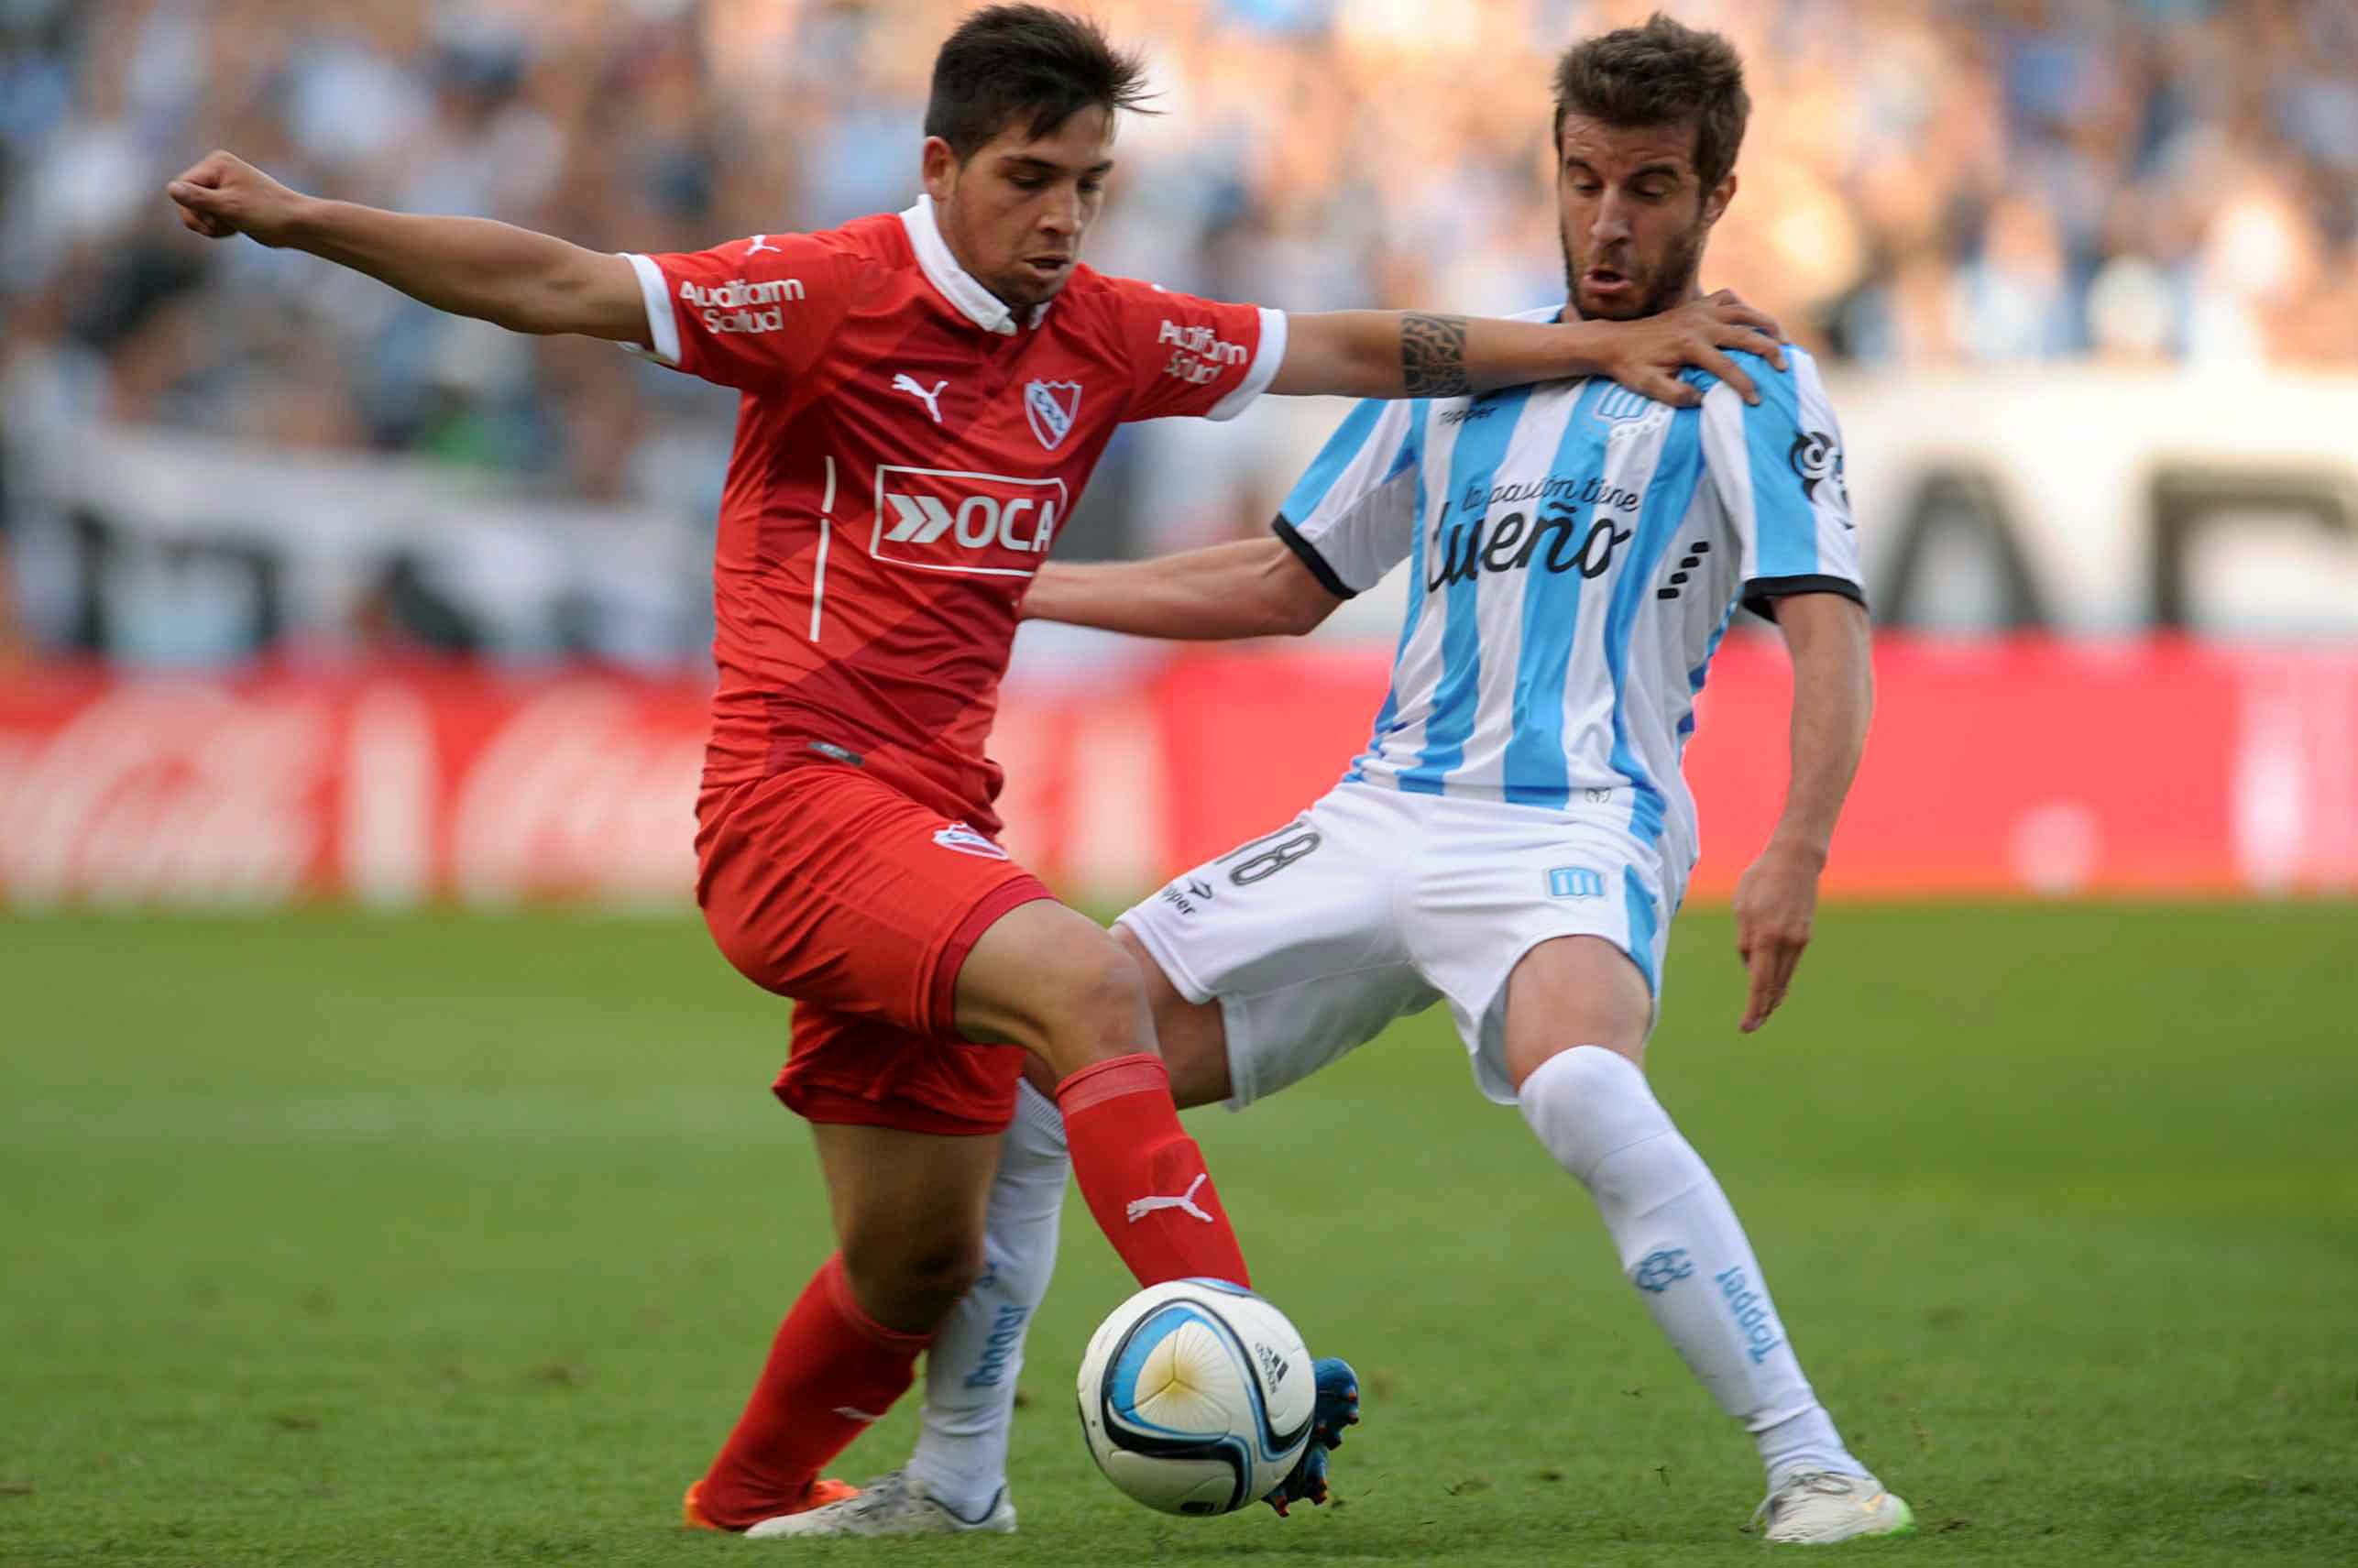 Racing perdió ante el Rojo pero sacó pasaje a la Libertadores 2016